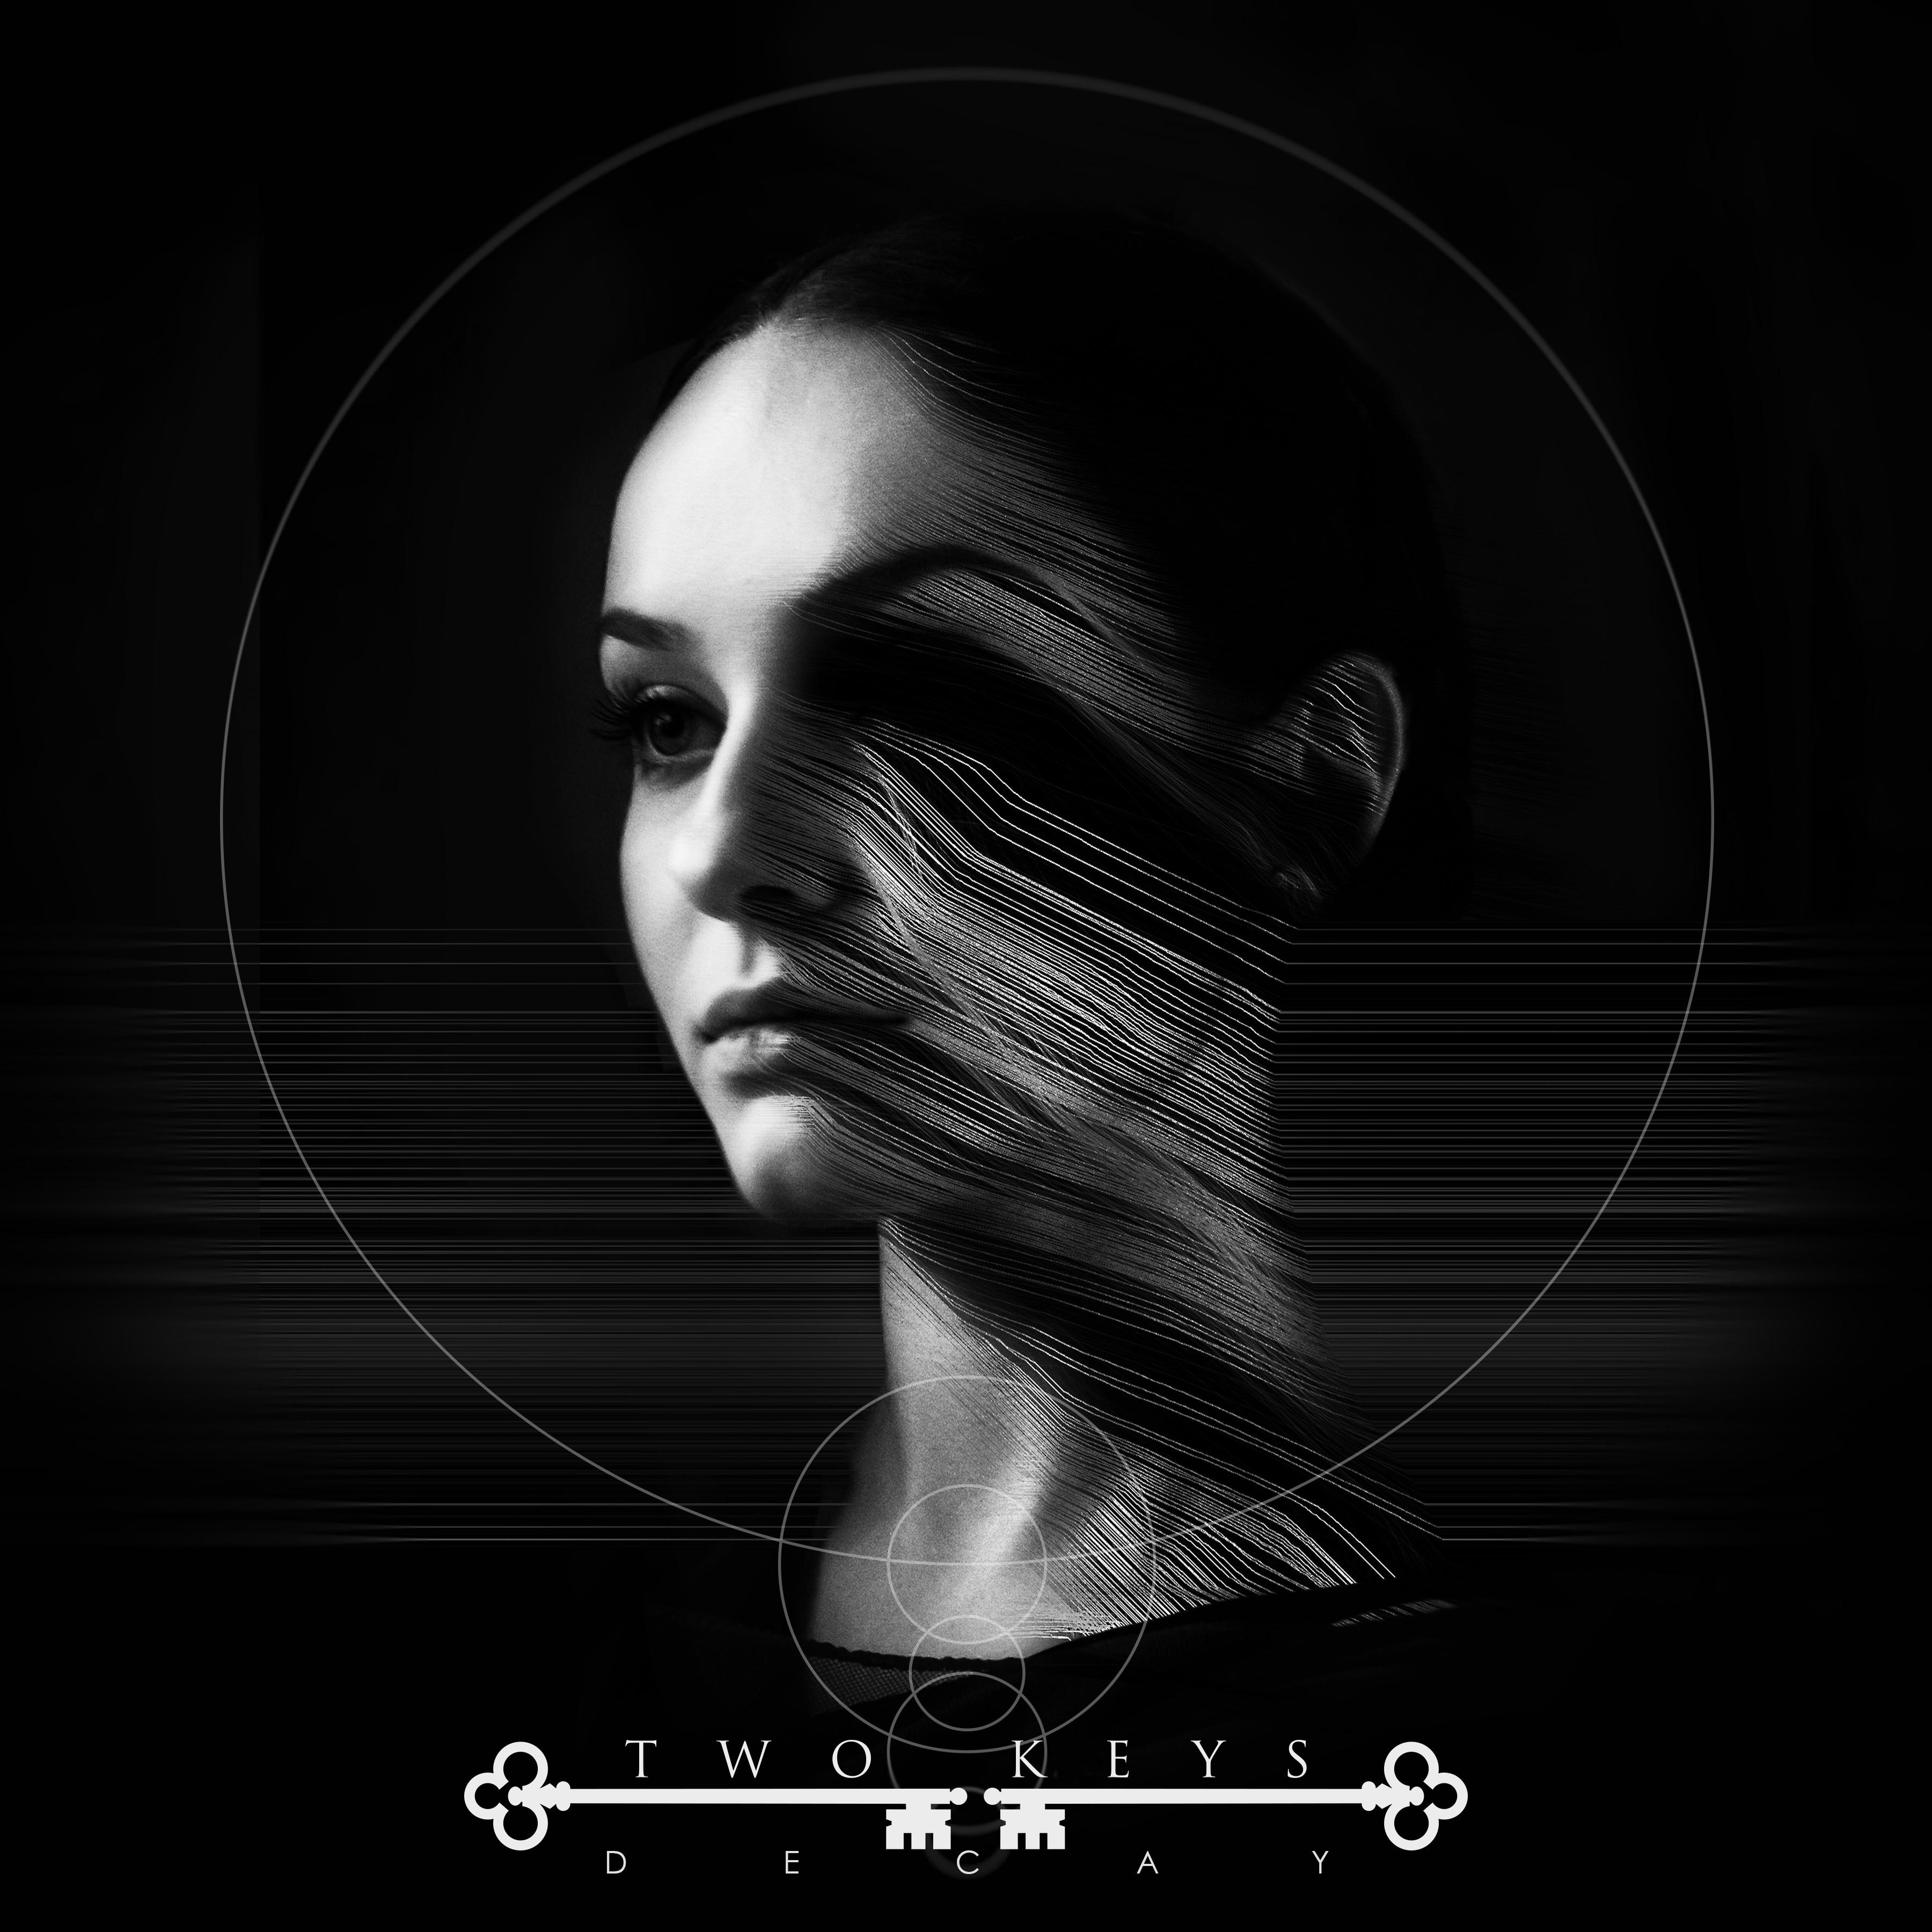 Premade Album Cover - Code: TIP_2020_022